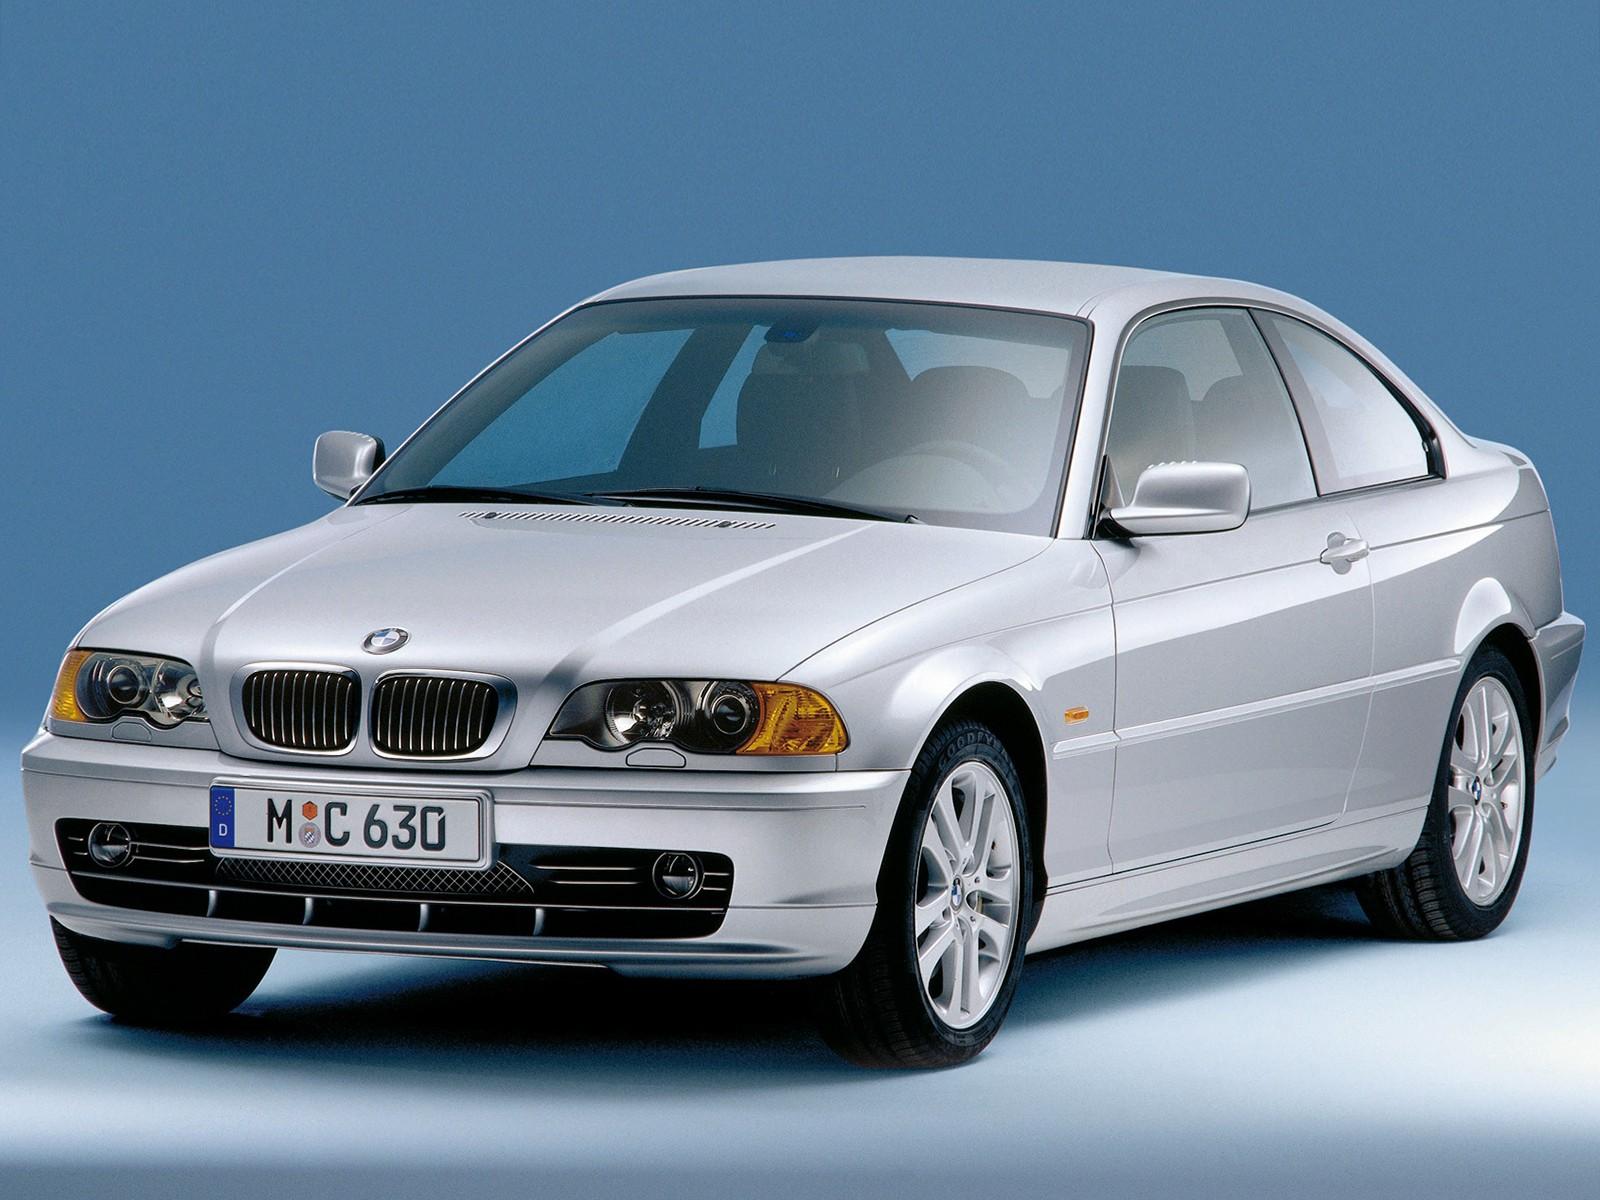 bmw 3 series coupe e46 1999 2000 2001 2002 2003 autoevolution. Black Bedroom Furniture Sets. Home Design Ideas